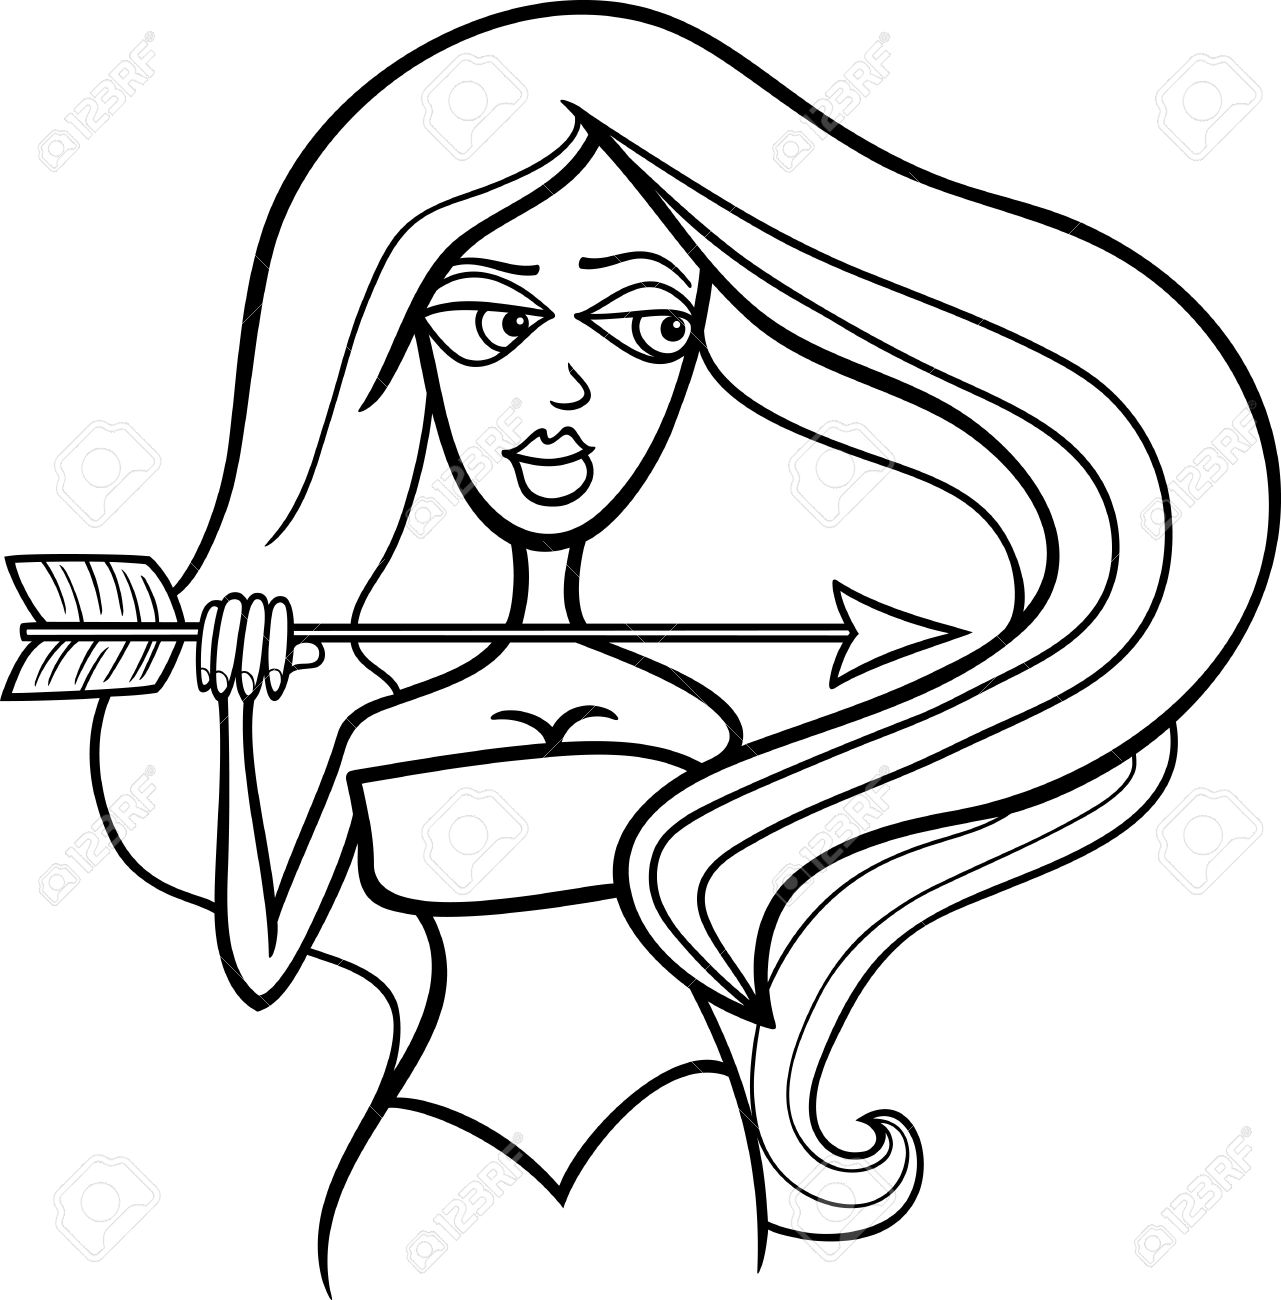 illustration of beautiful woman cartoon character with arrow